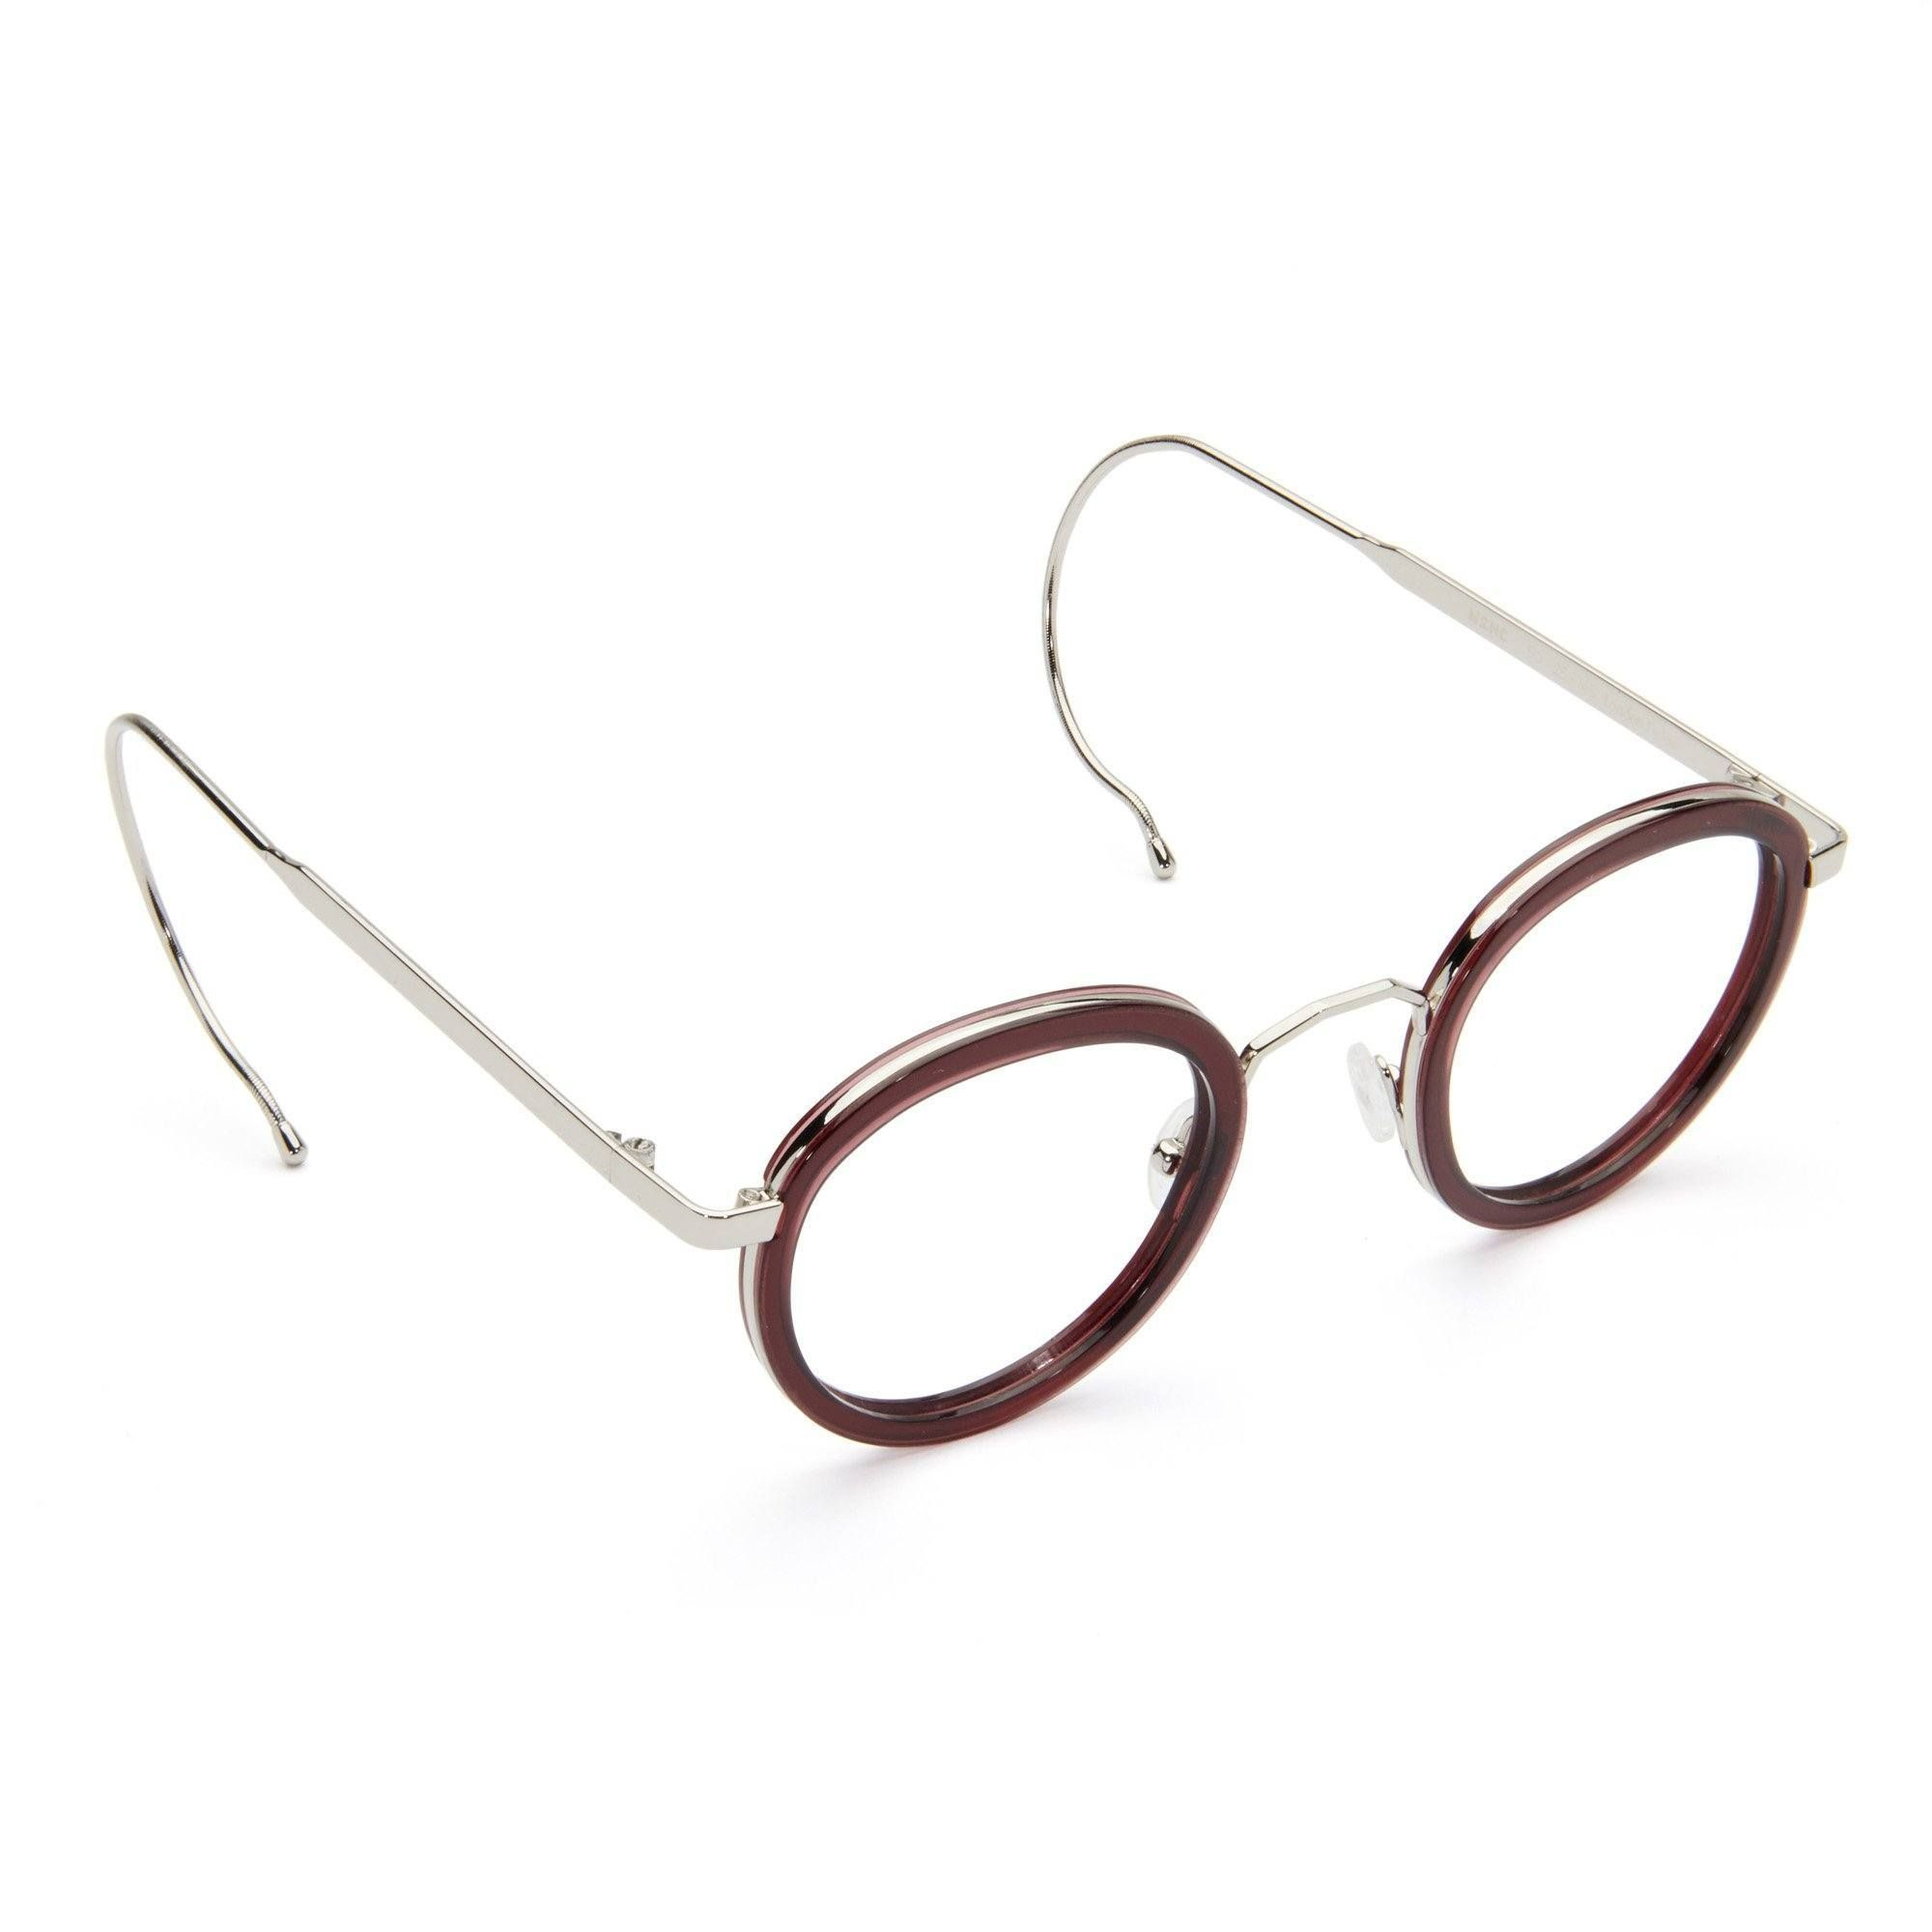 Burgundy Retro Vintage Round Circle Frame Eyeglasses Clear Lens Eye Glasses